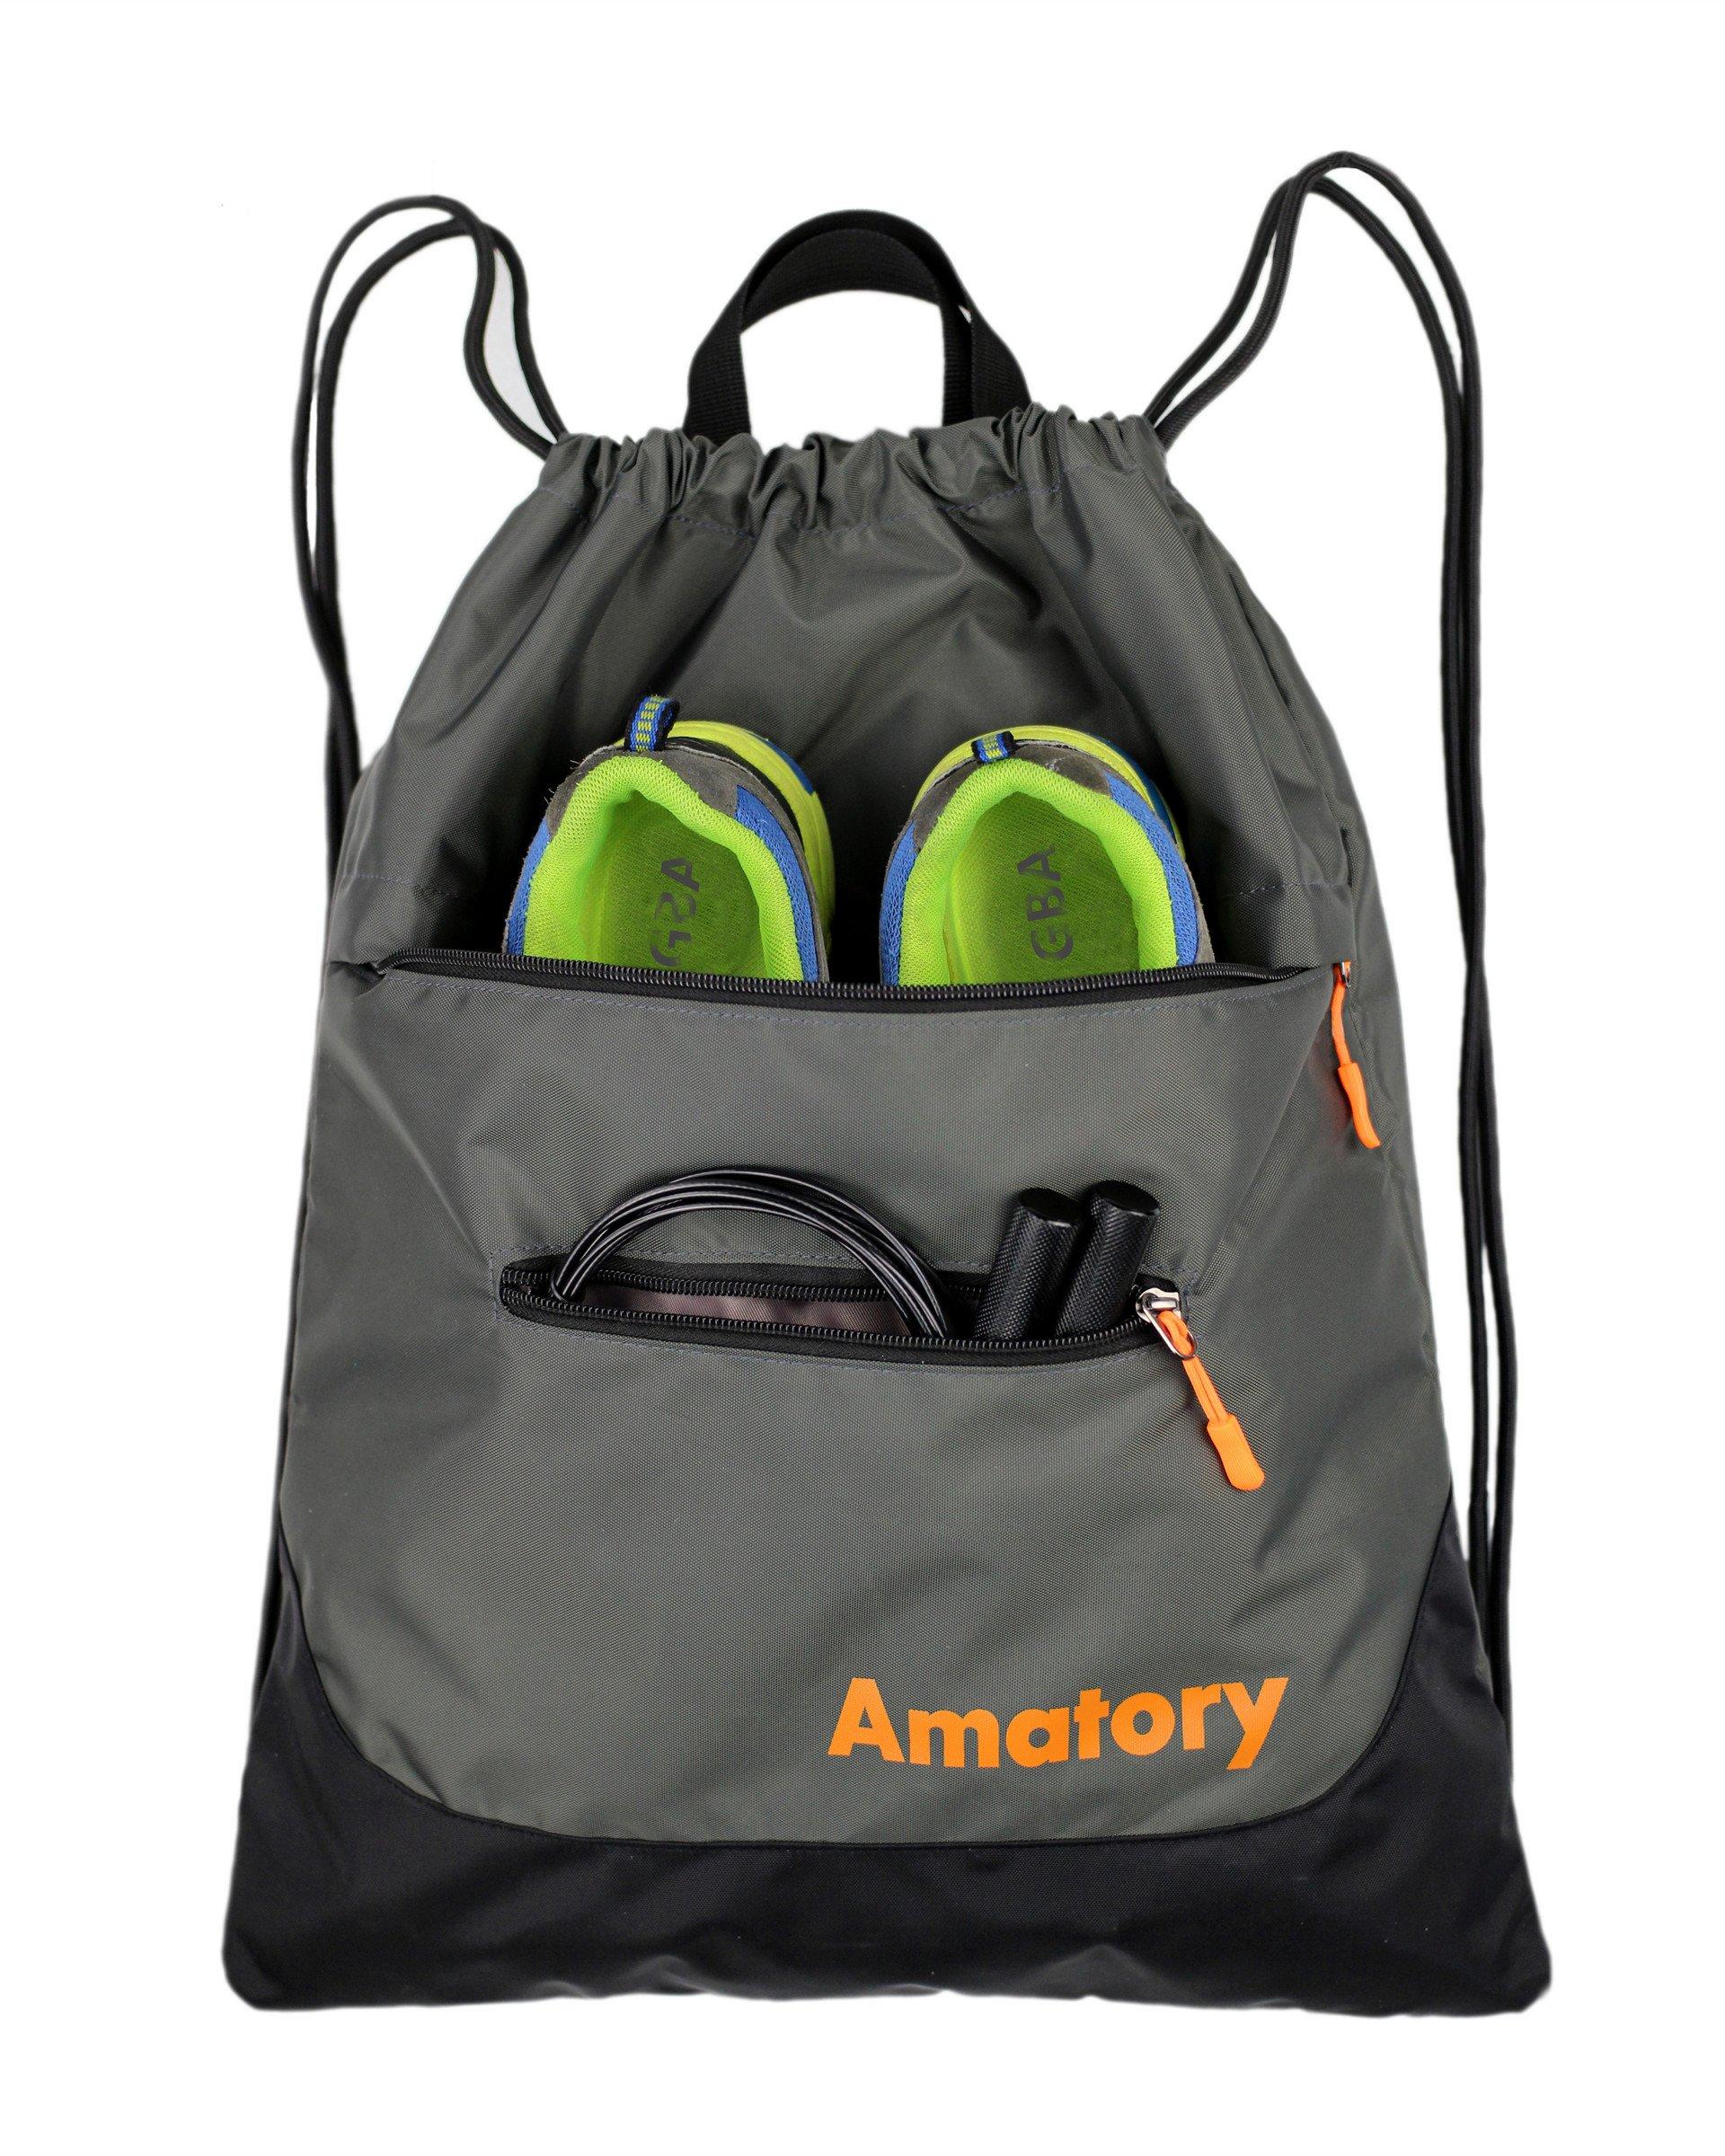 Amatory Drawstring Backpack Sports Gym Waterproof String Bag Cinch Sack Sackpack Gymsack (Gray)